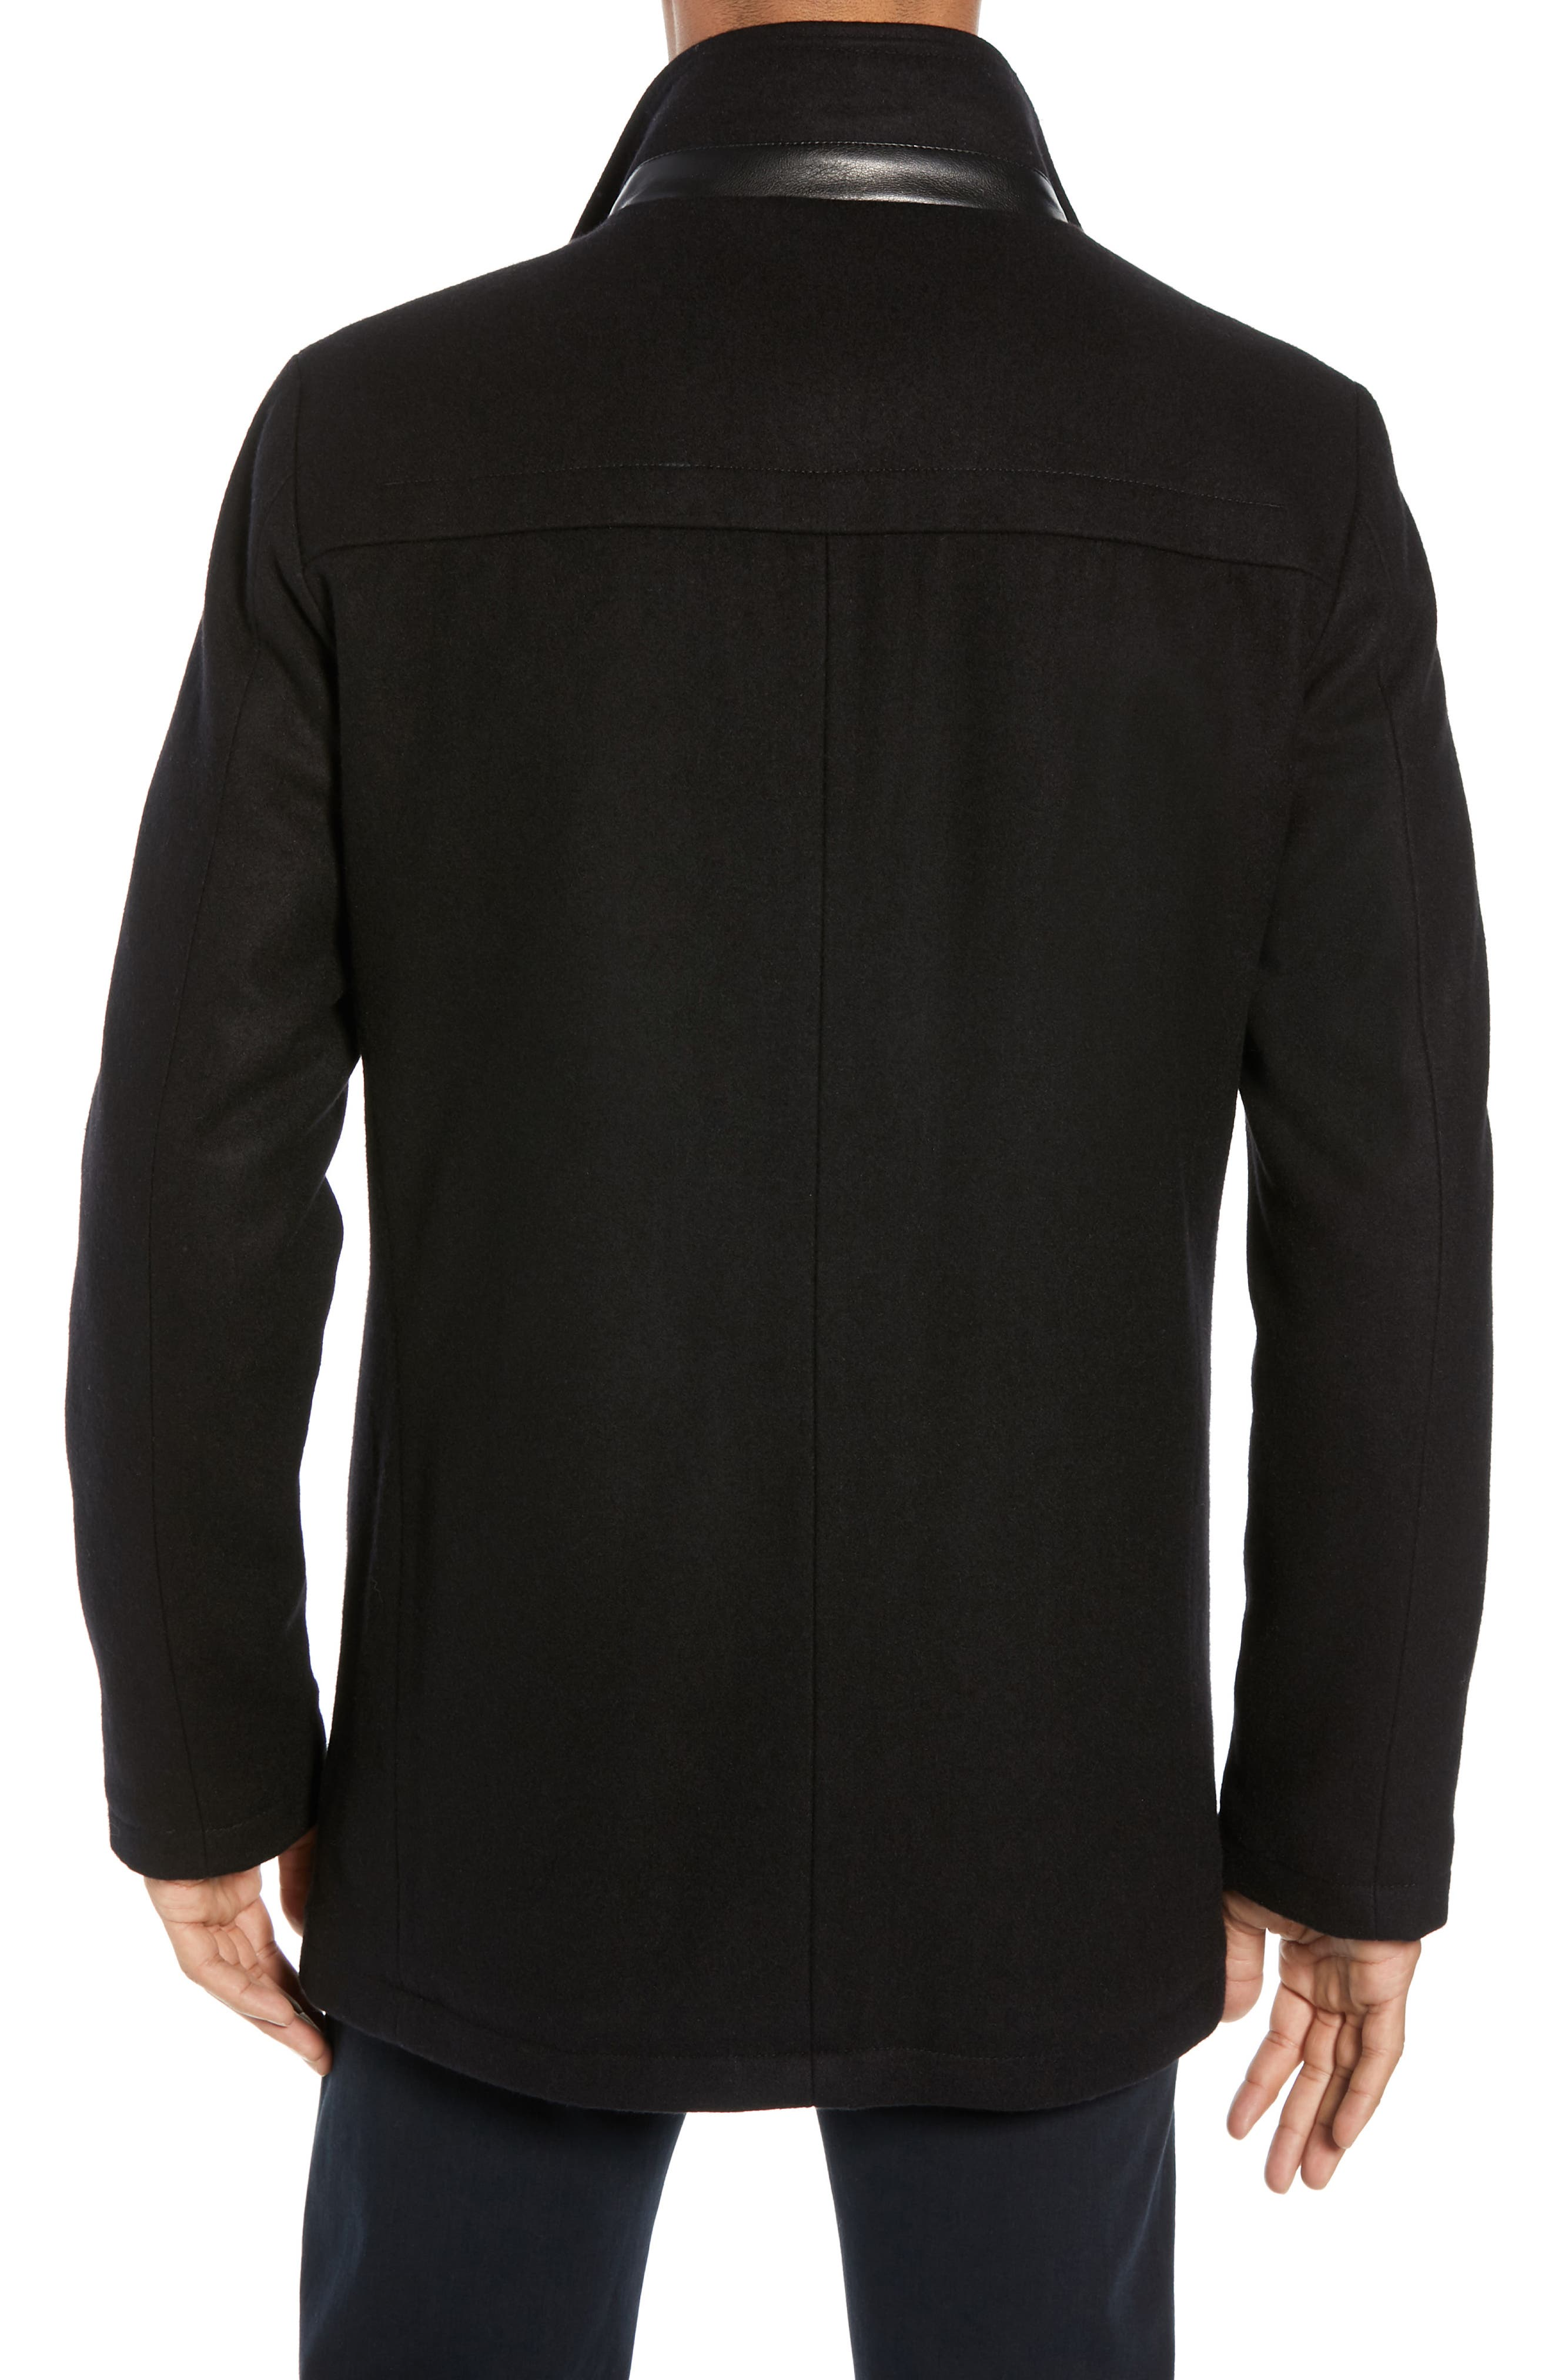 Classic Wool Blend Car Coat with Inset Bib,                             Alternate thumbnail 2, color,                             BLACK